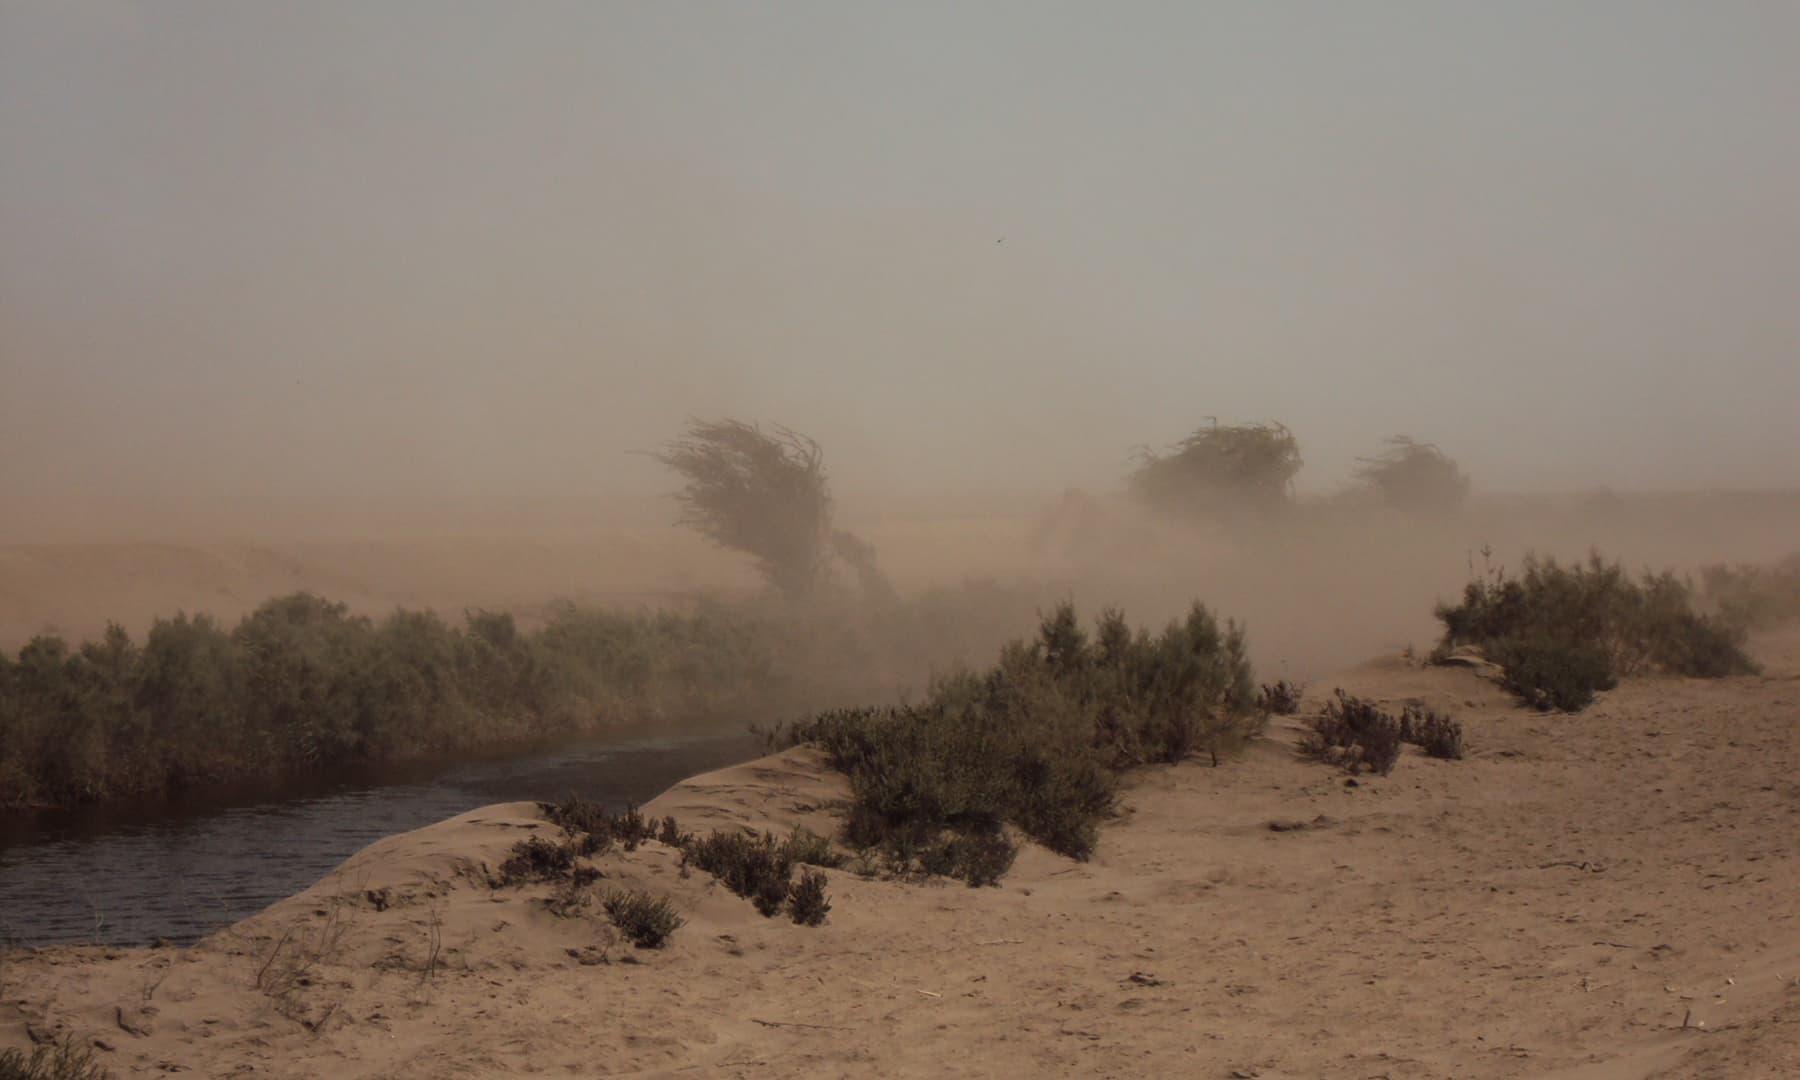 مٹی اڑاتی تیز ہوا—تصویر ابوبکر شیخ